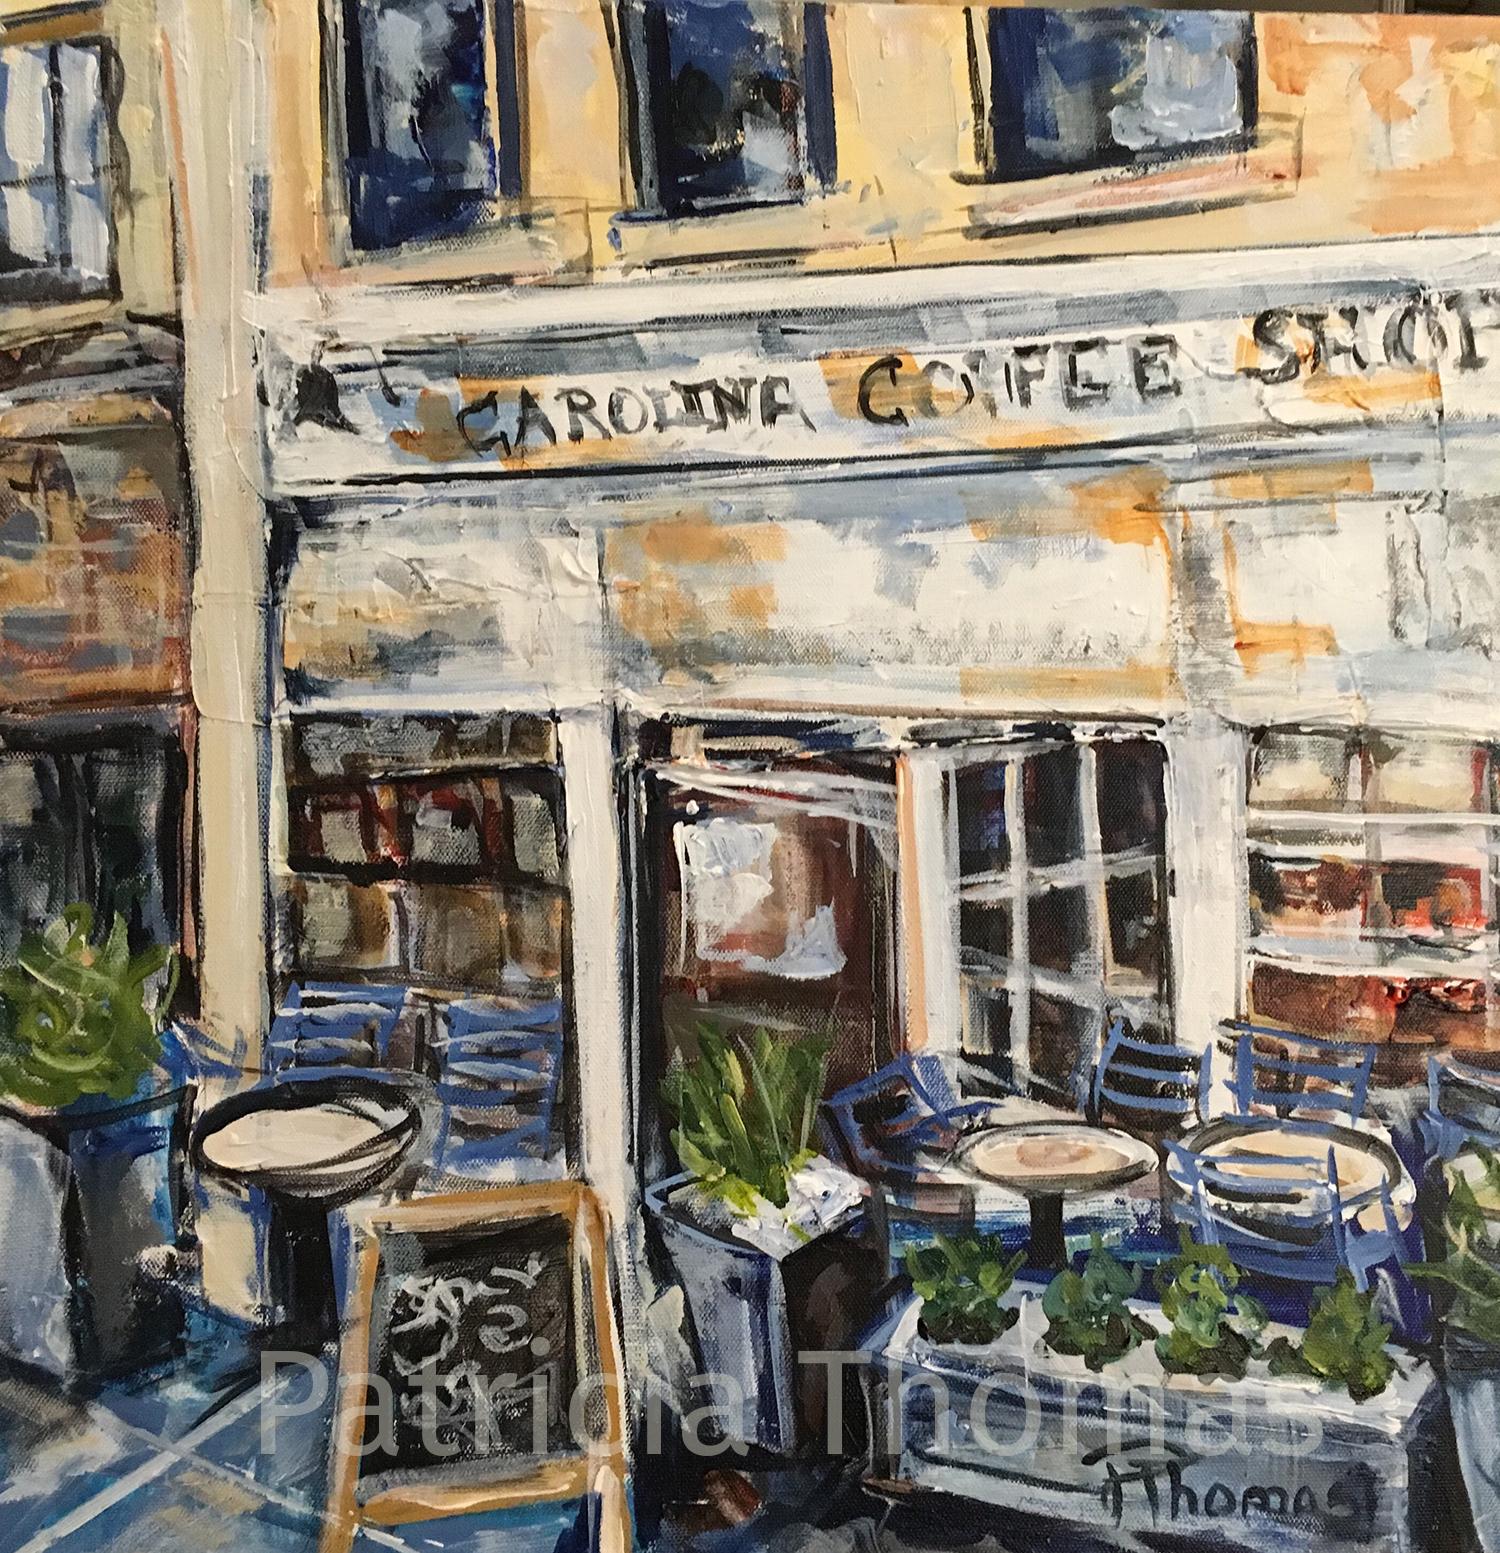 Carolina Coffee Shop Chapel Hill.jpg